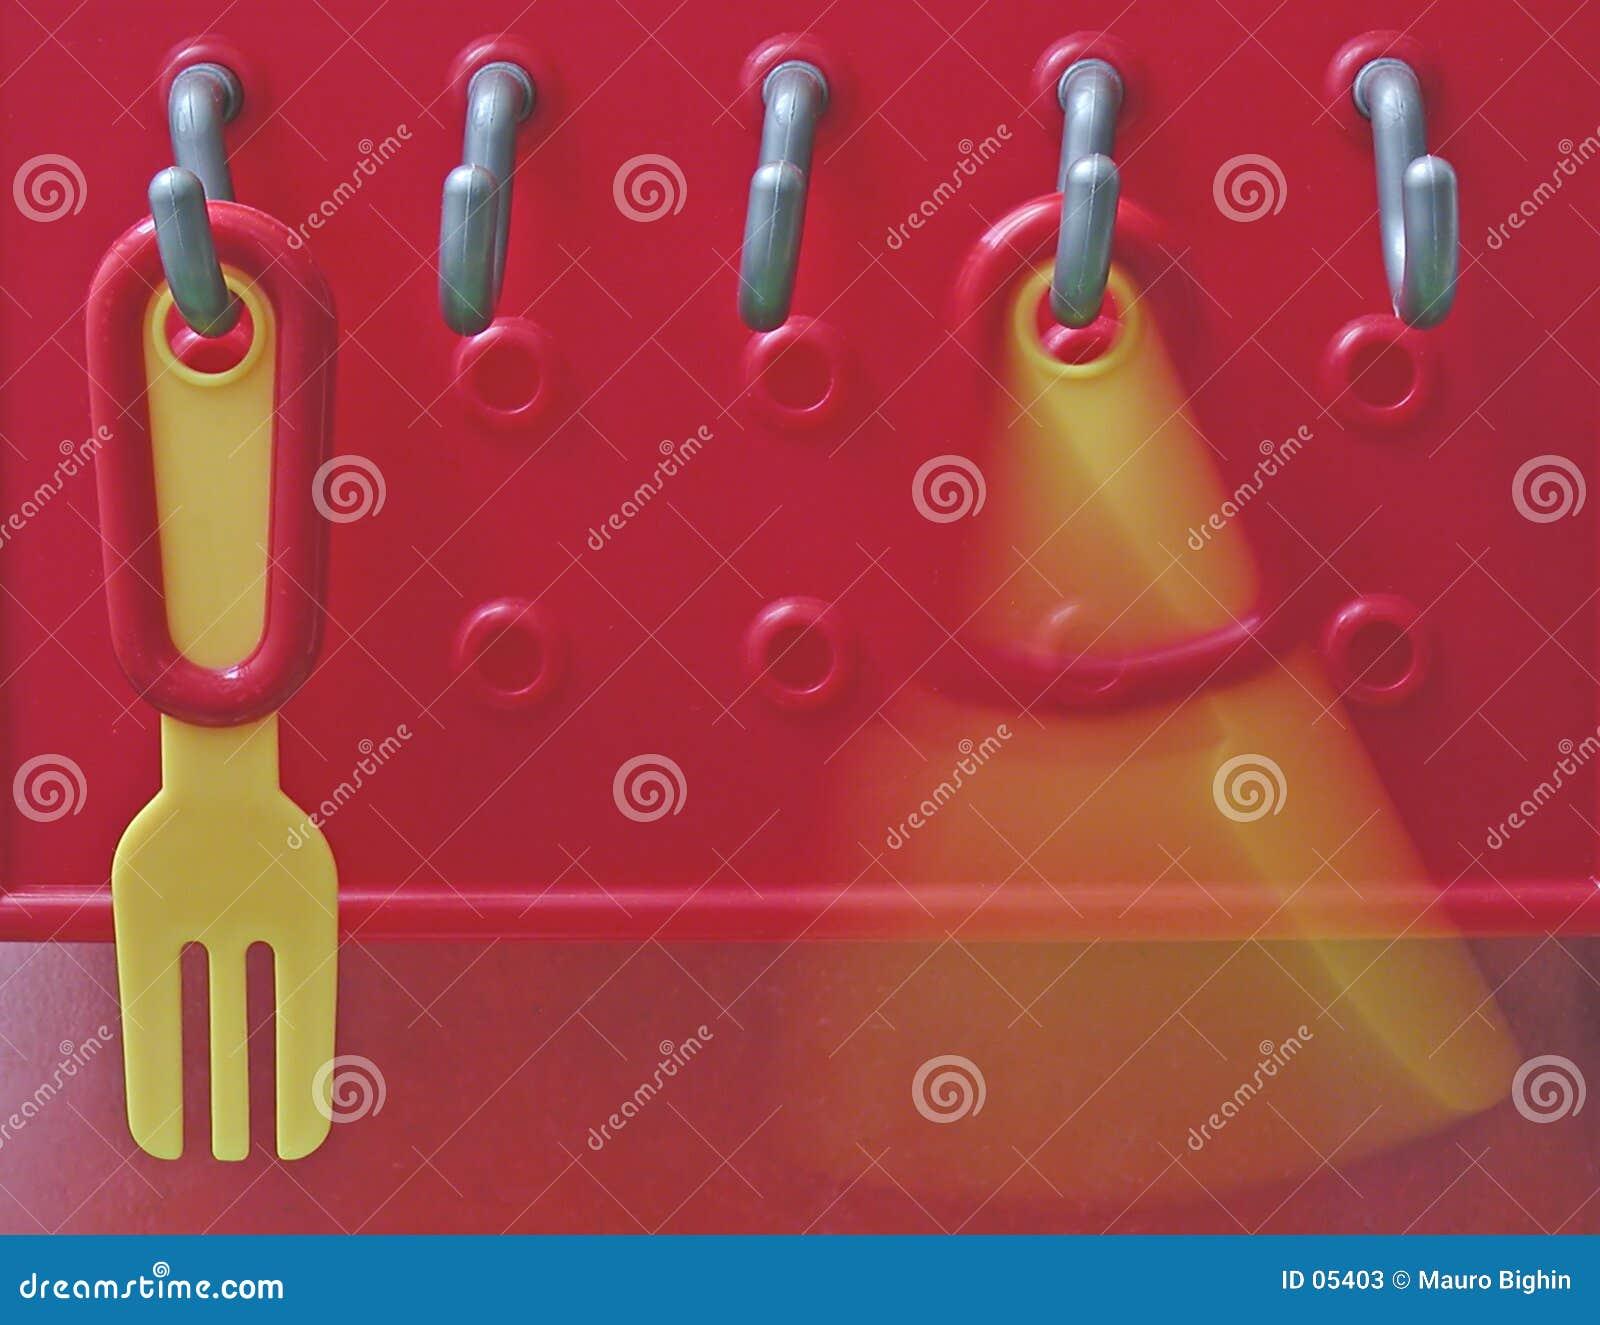 Forquilha e faca plásticas